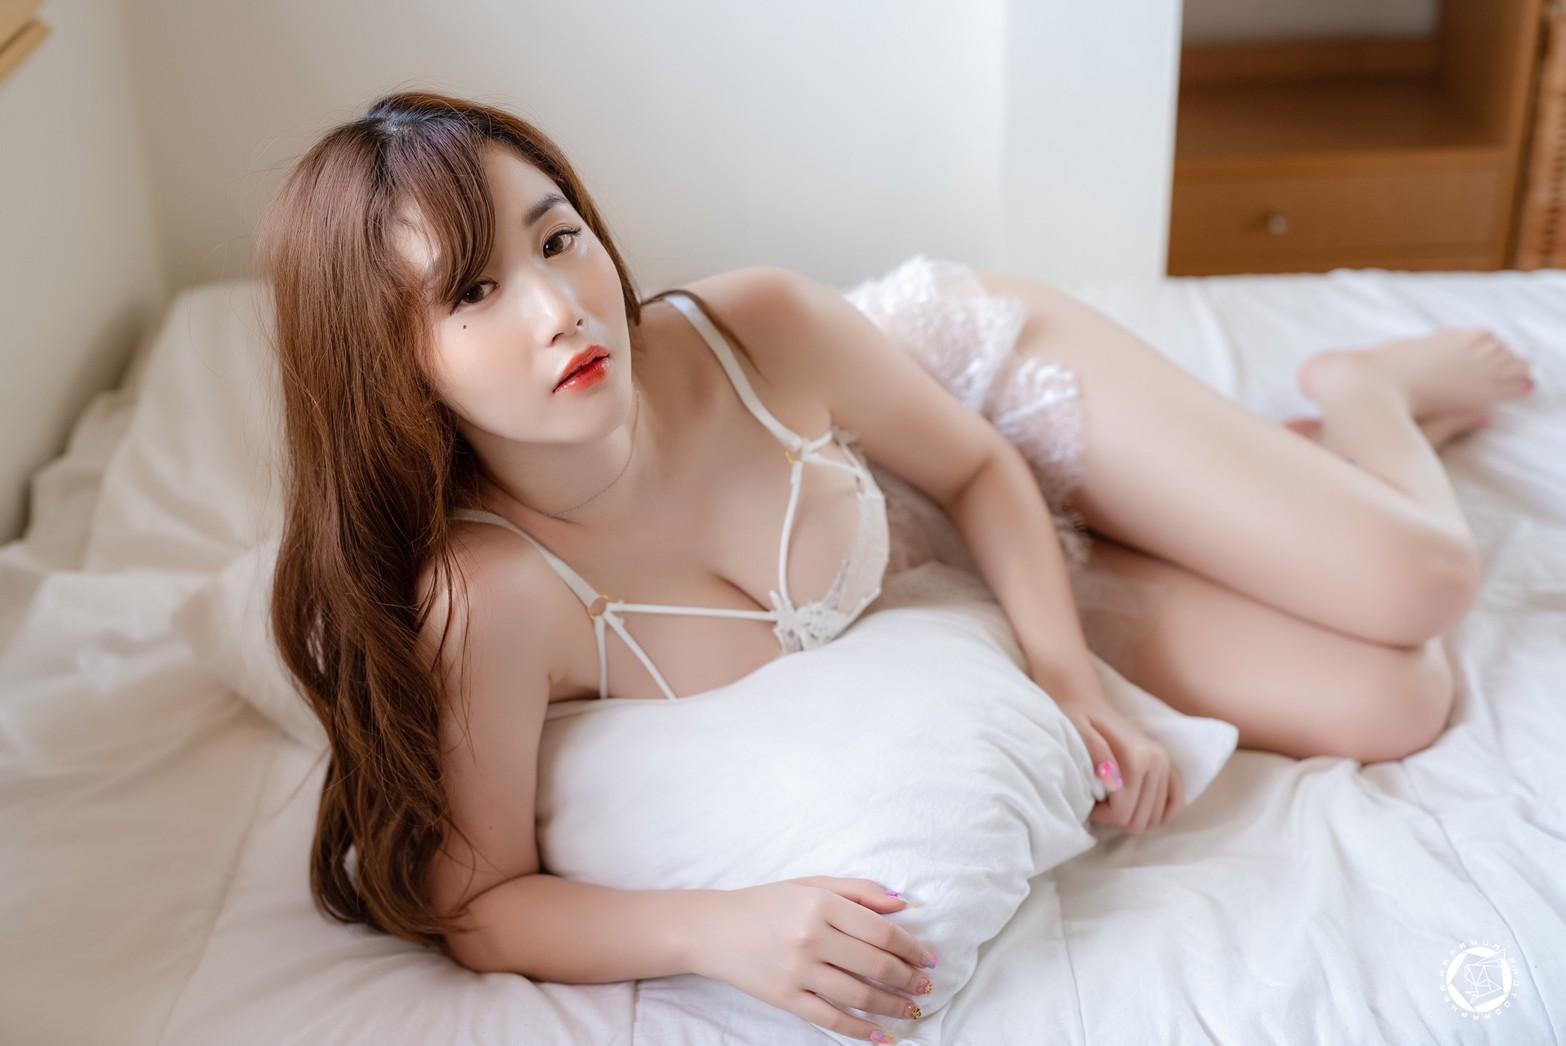 Thailand Beautyful Girl Pic No.262 || Akair Manita